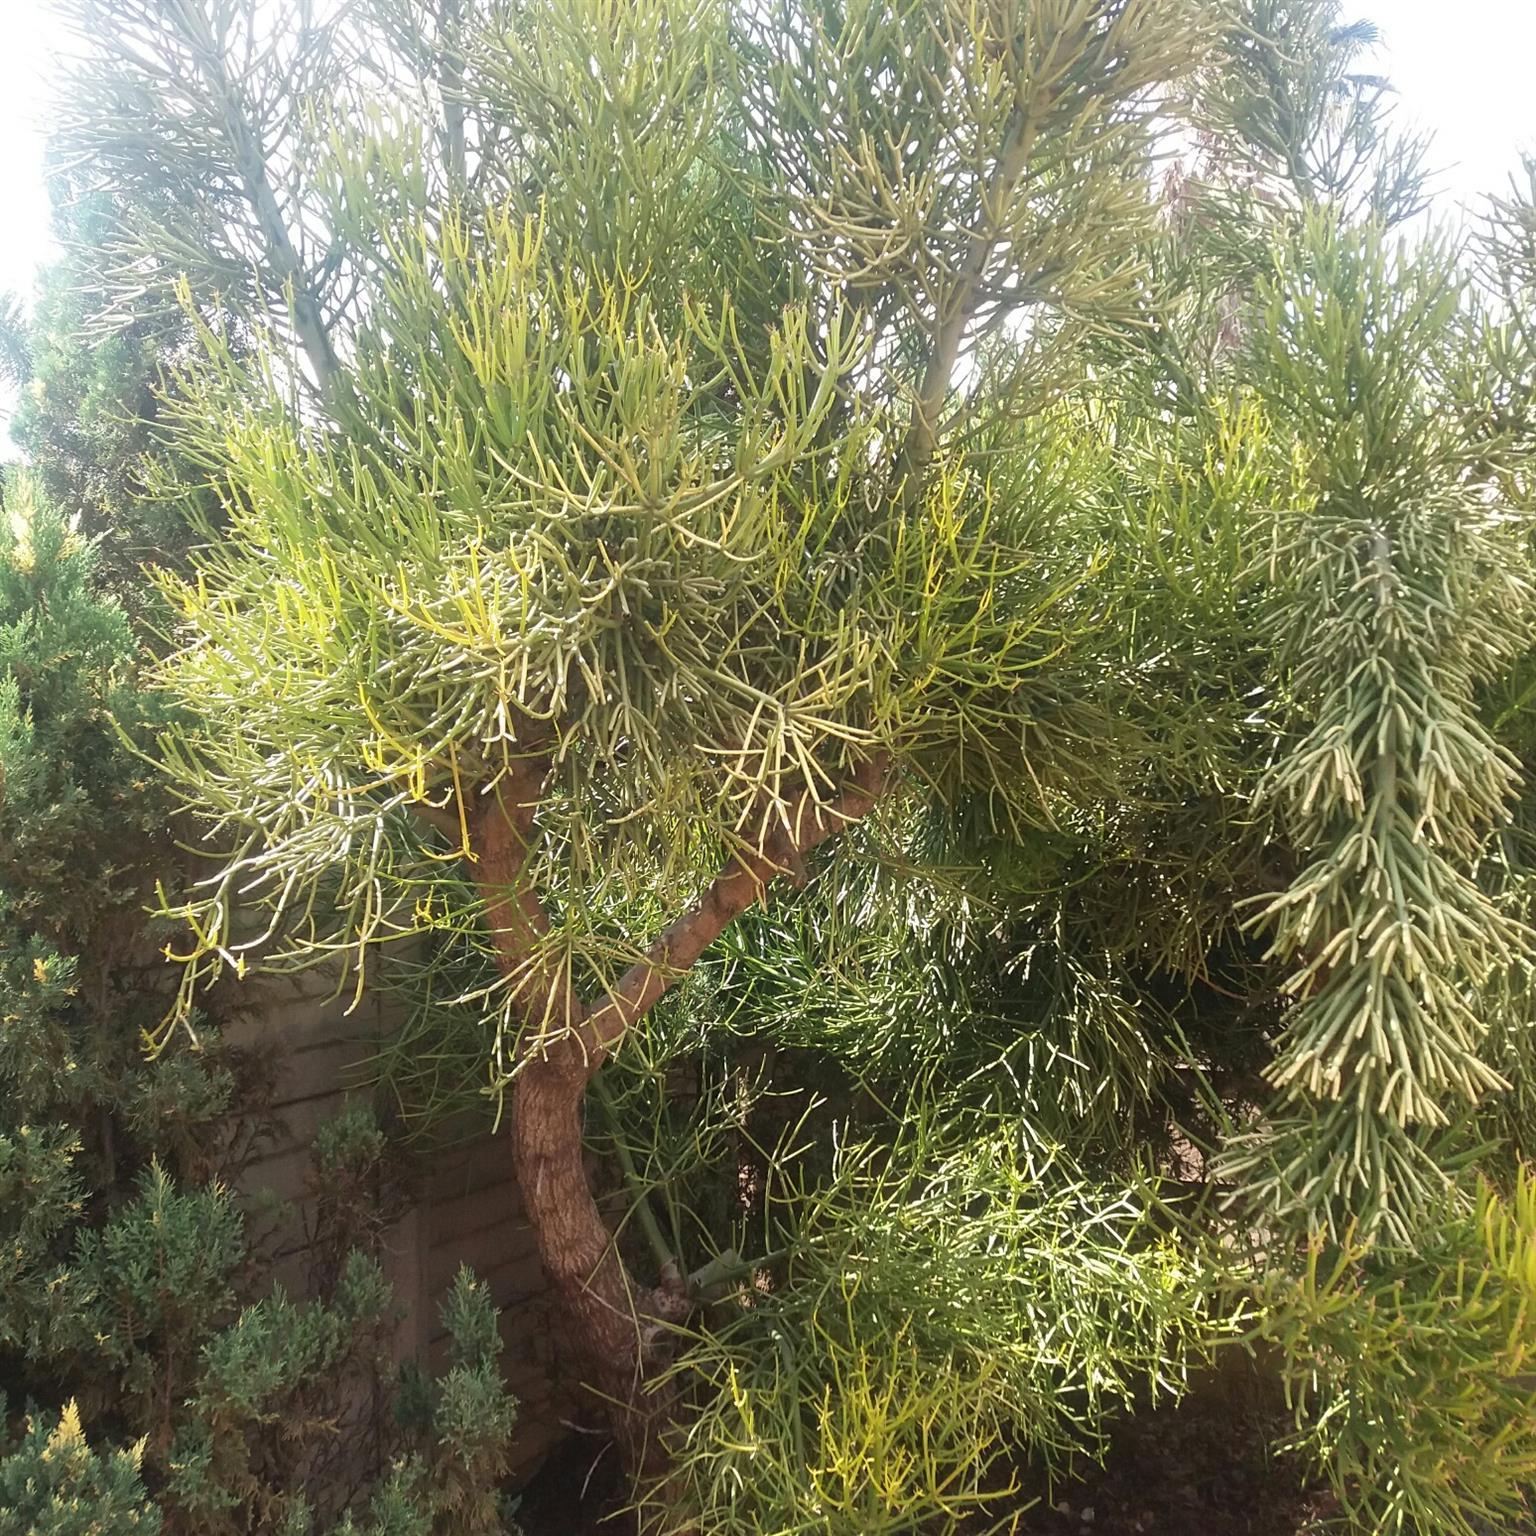 Plants, Cacti, Aloe, philodendron, etc